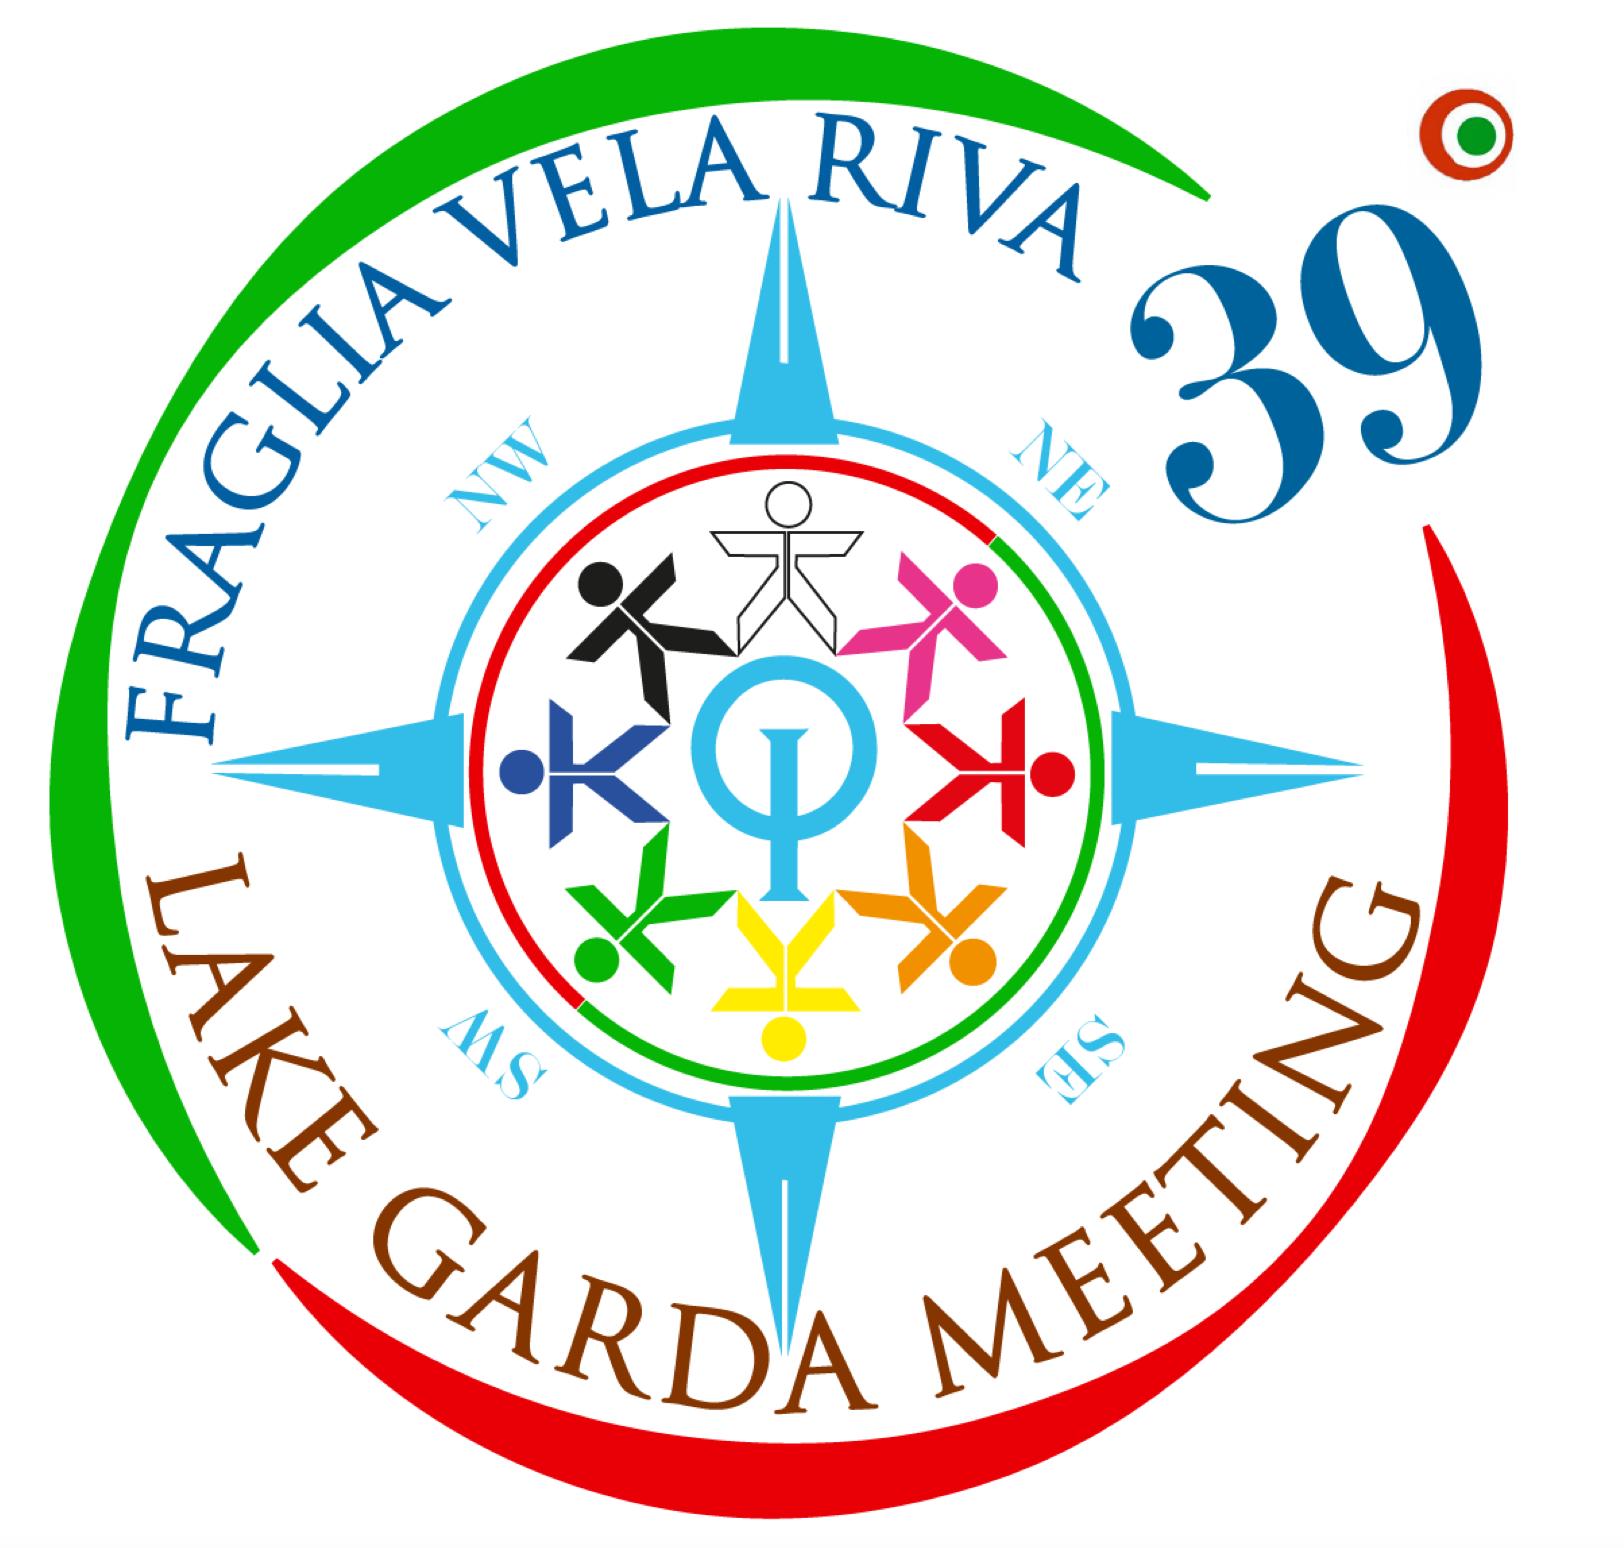 Optimist Garda Meeting